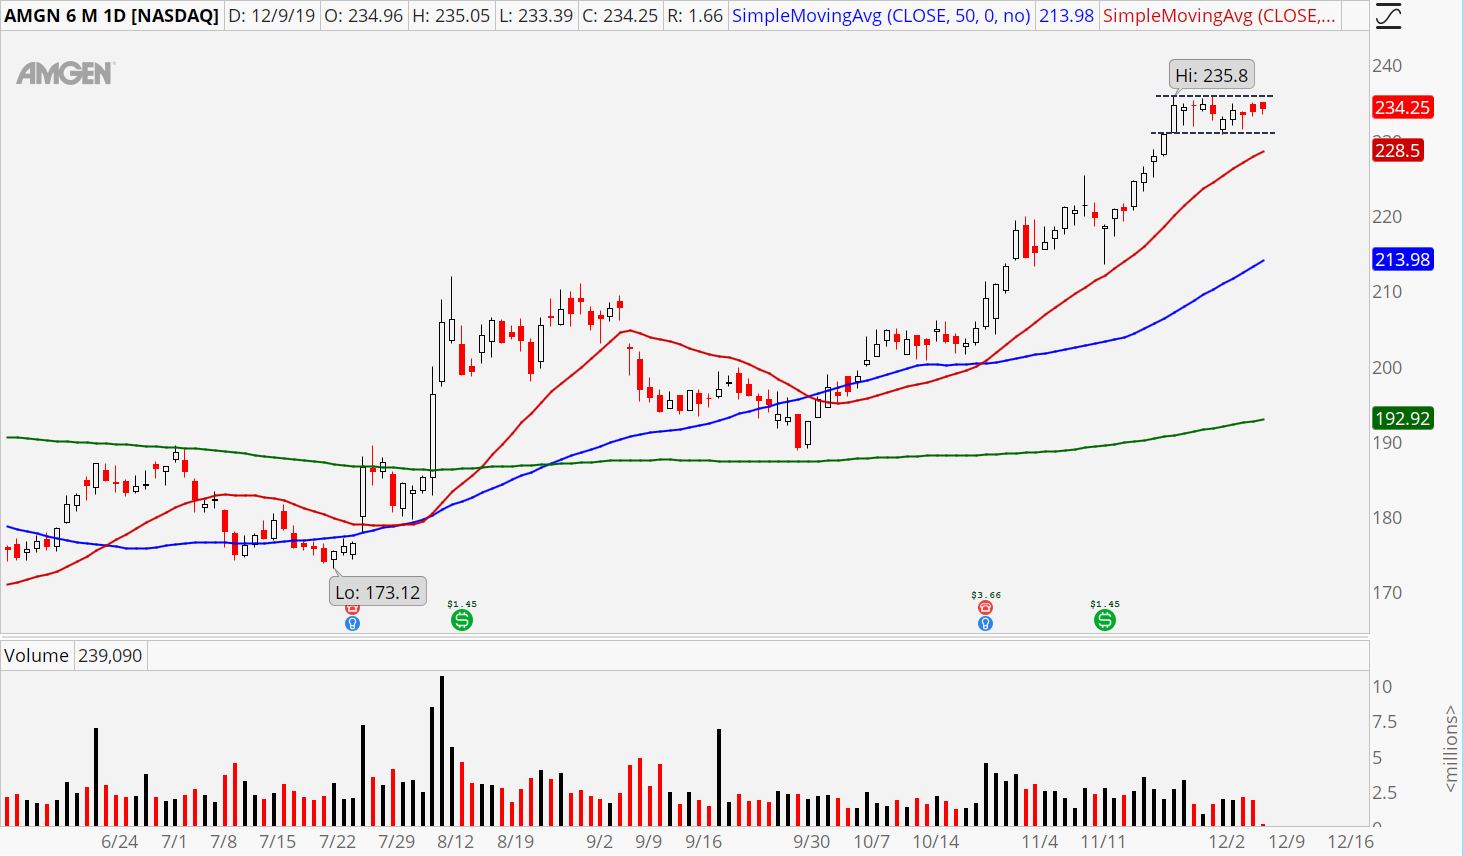 3 Healthcare Stocks to Buy: Amgen (AMGN)